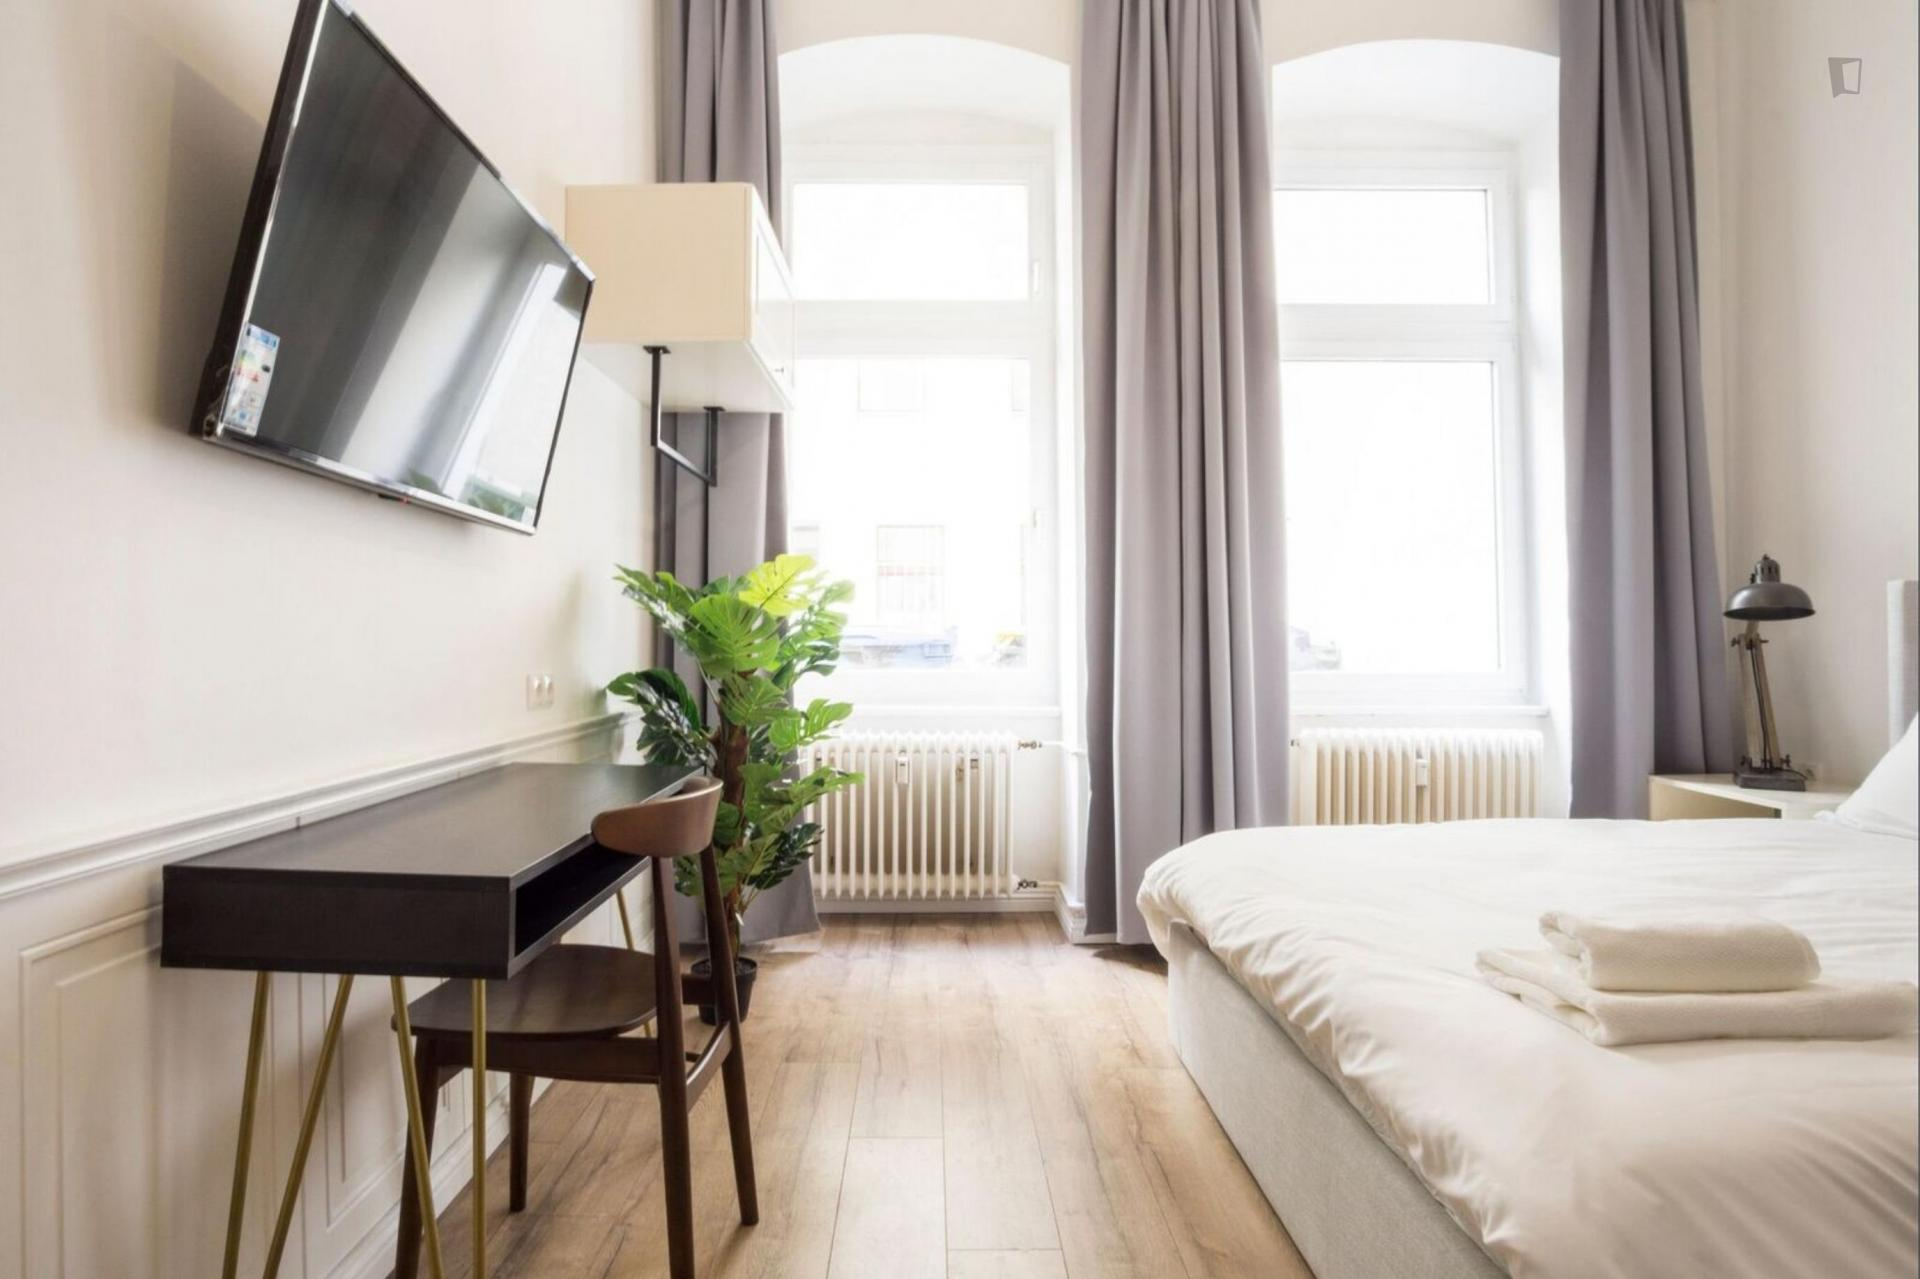 Rucker - Modern furnished studio in Berlin